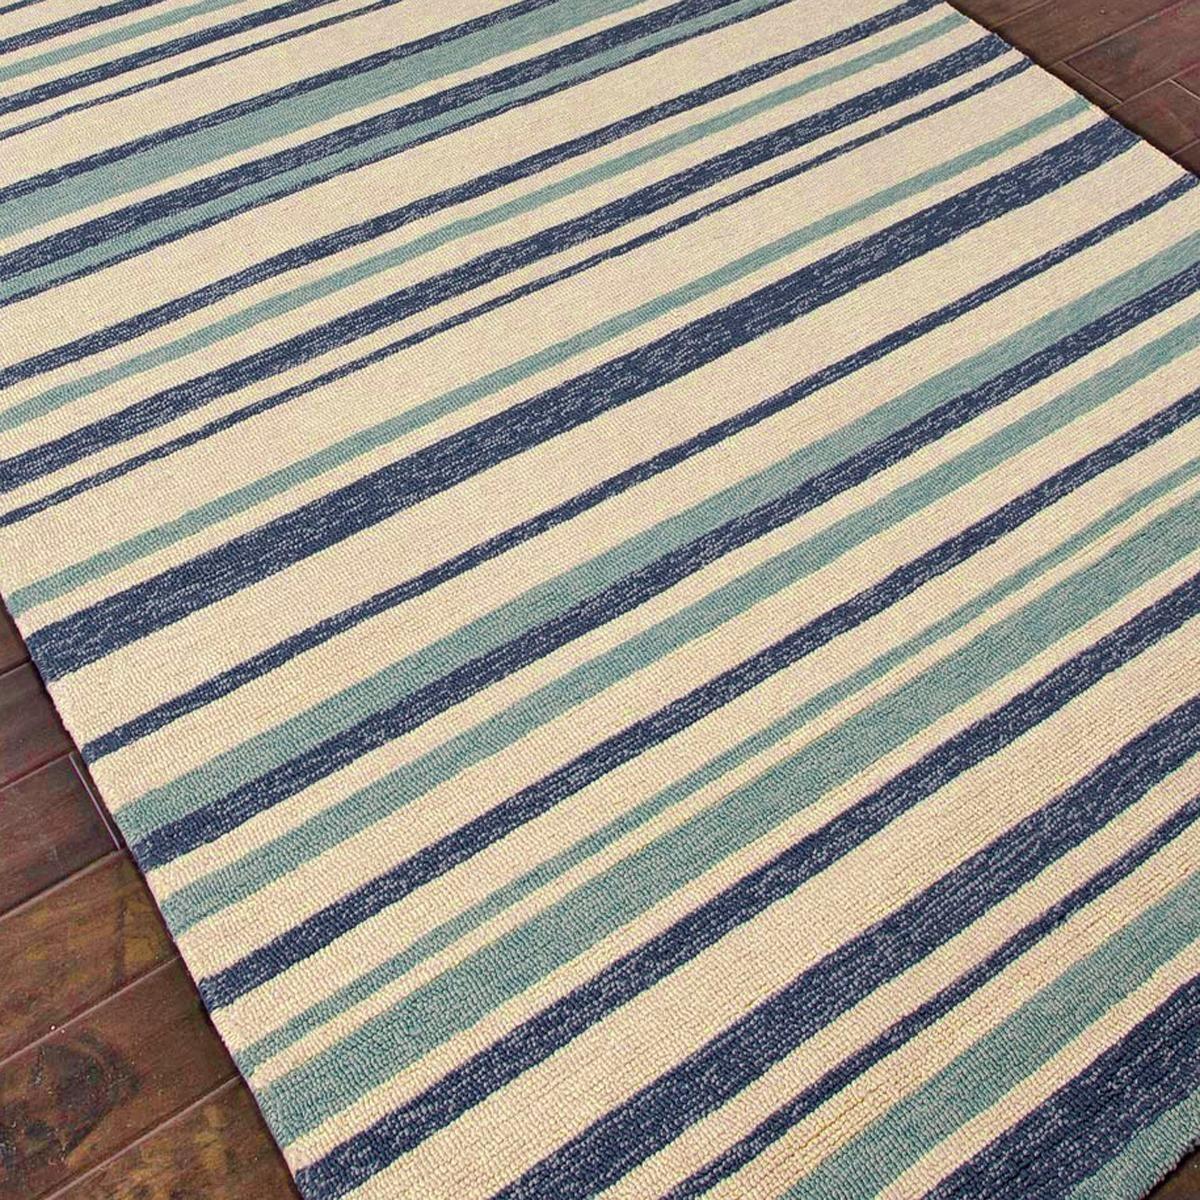 Eternity Landscapes Ocean Area Rug: Outdoor Indoor Varying Stripes Rugs: Navy/aqua/cream 7.6 X